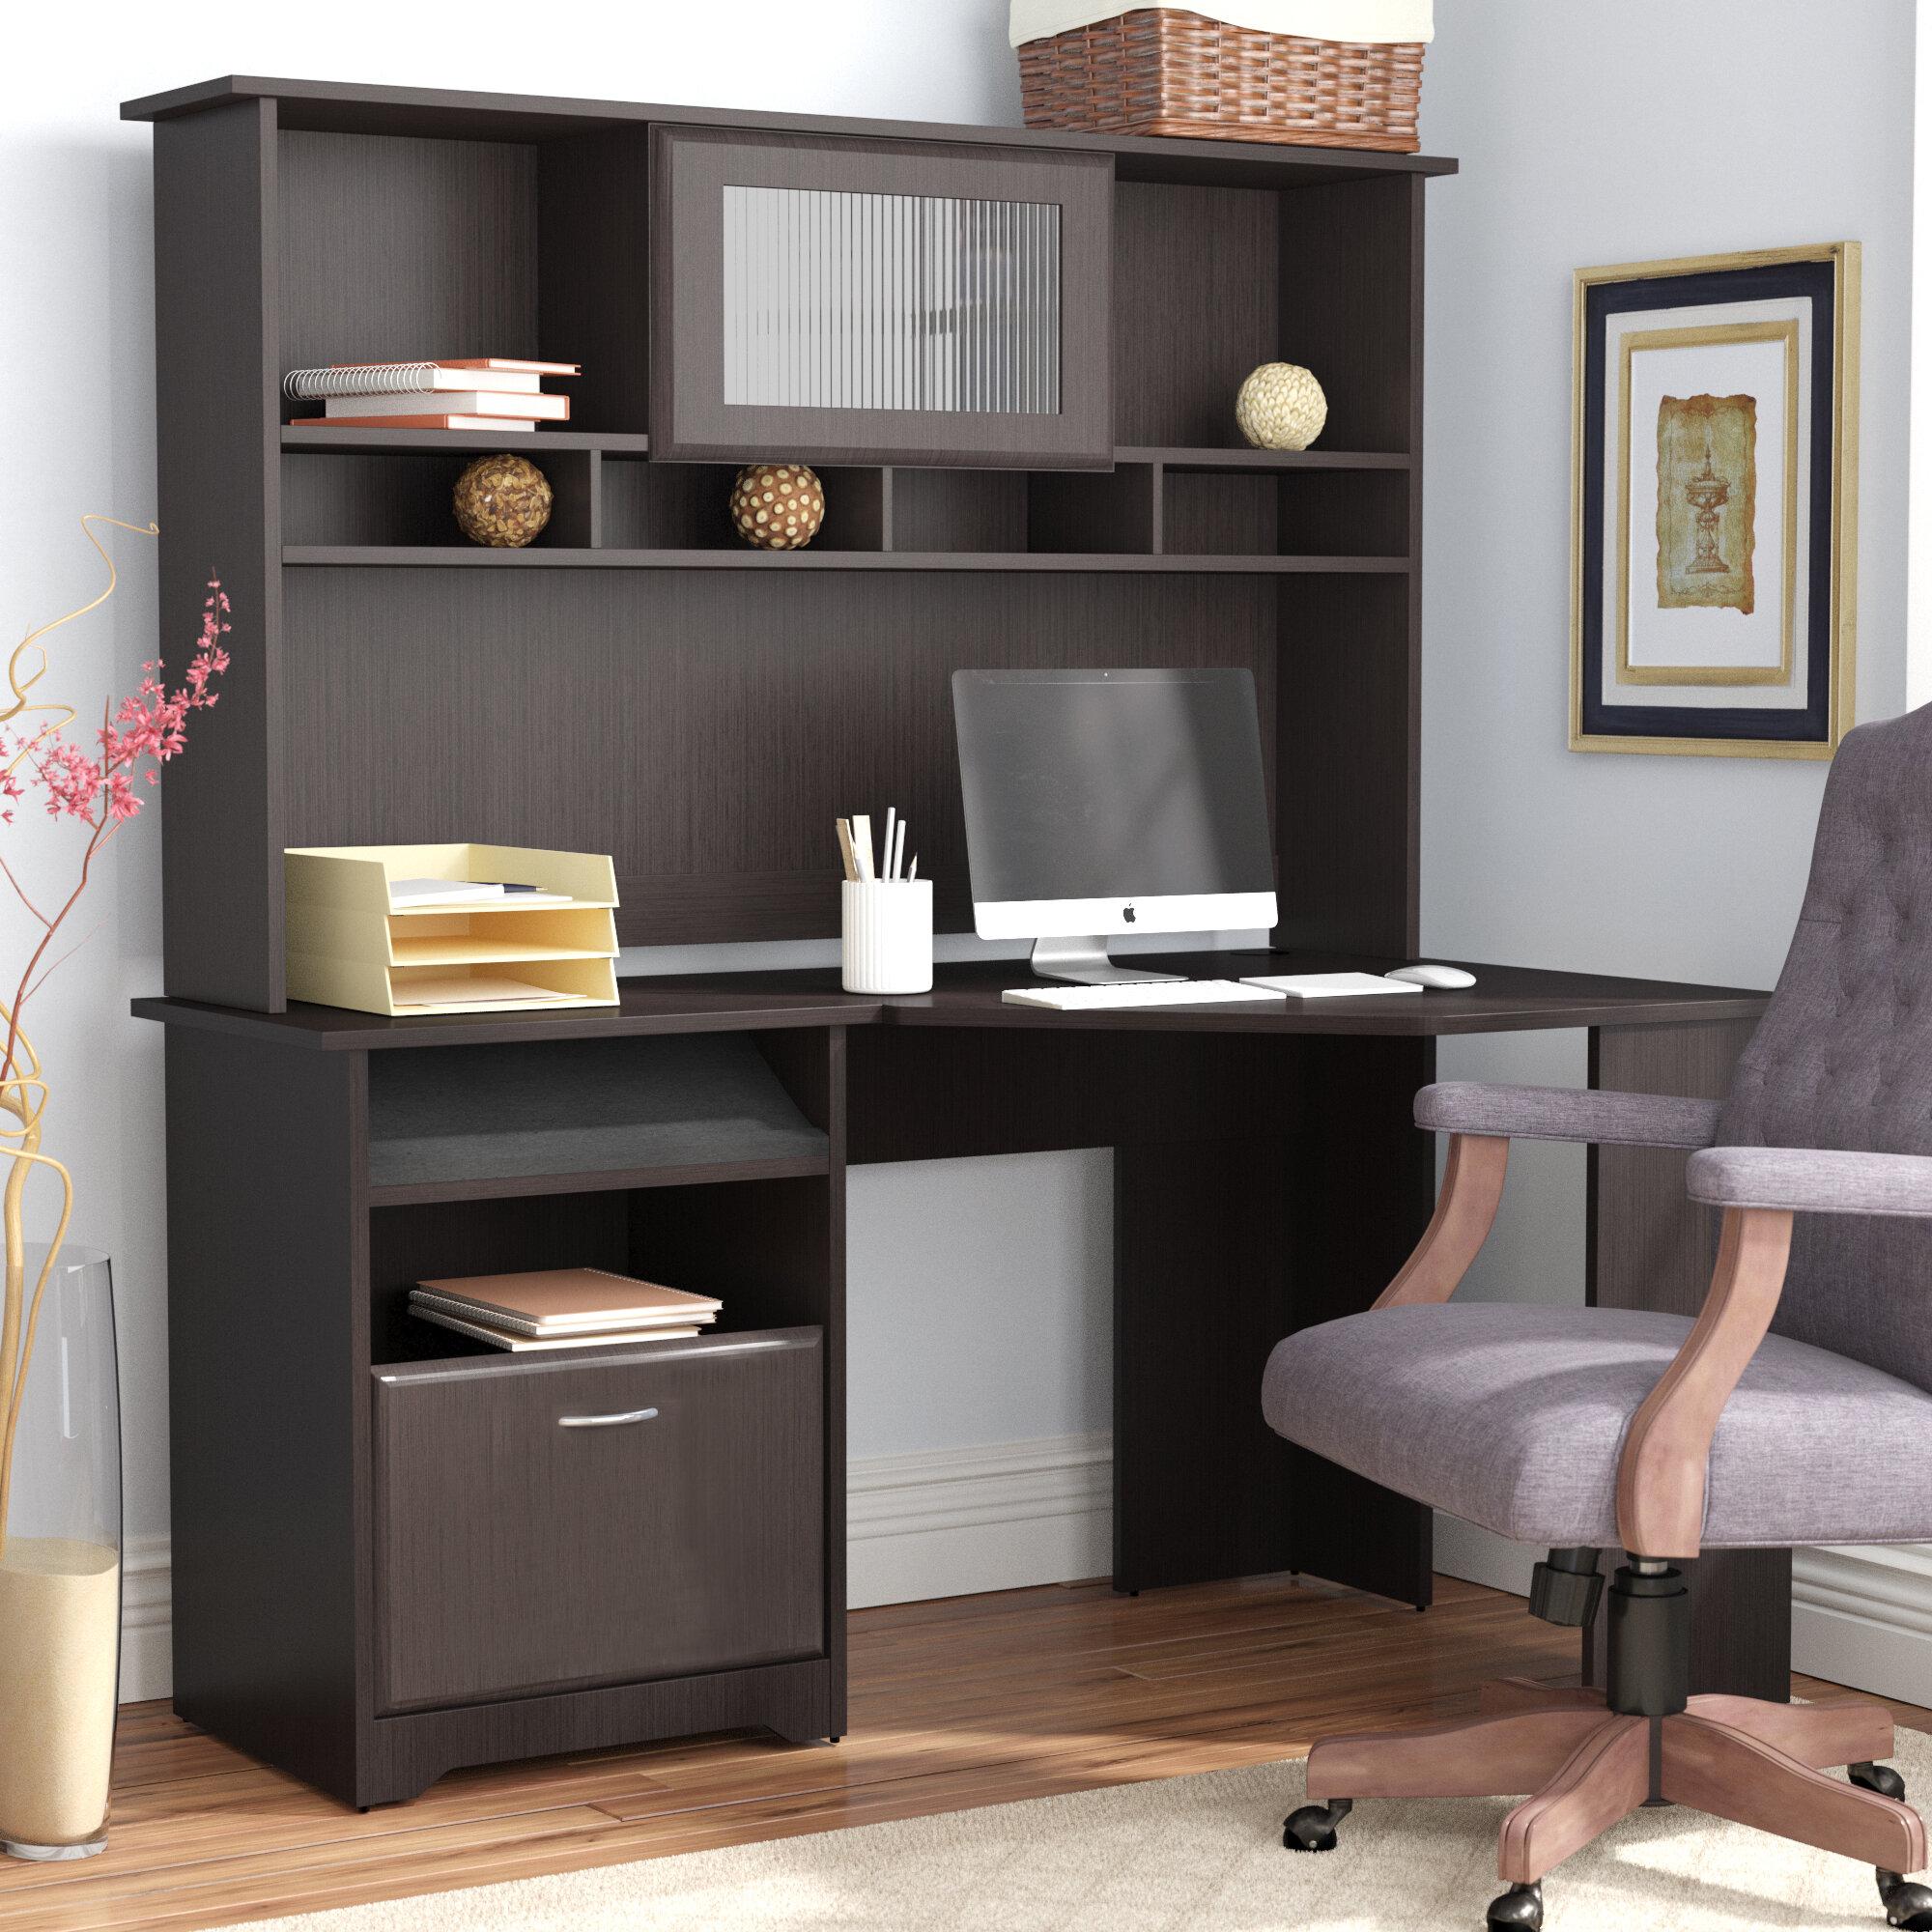 Red Barrel Studio Hilale Corner Computer Desk With Hutch Reviews Wayfair